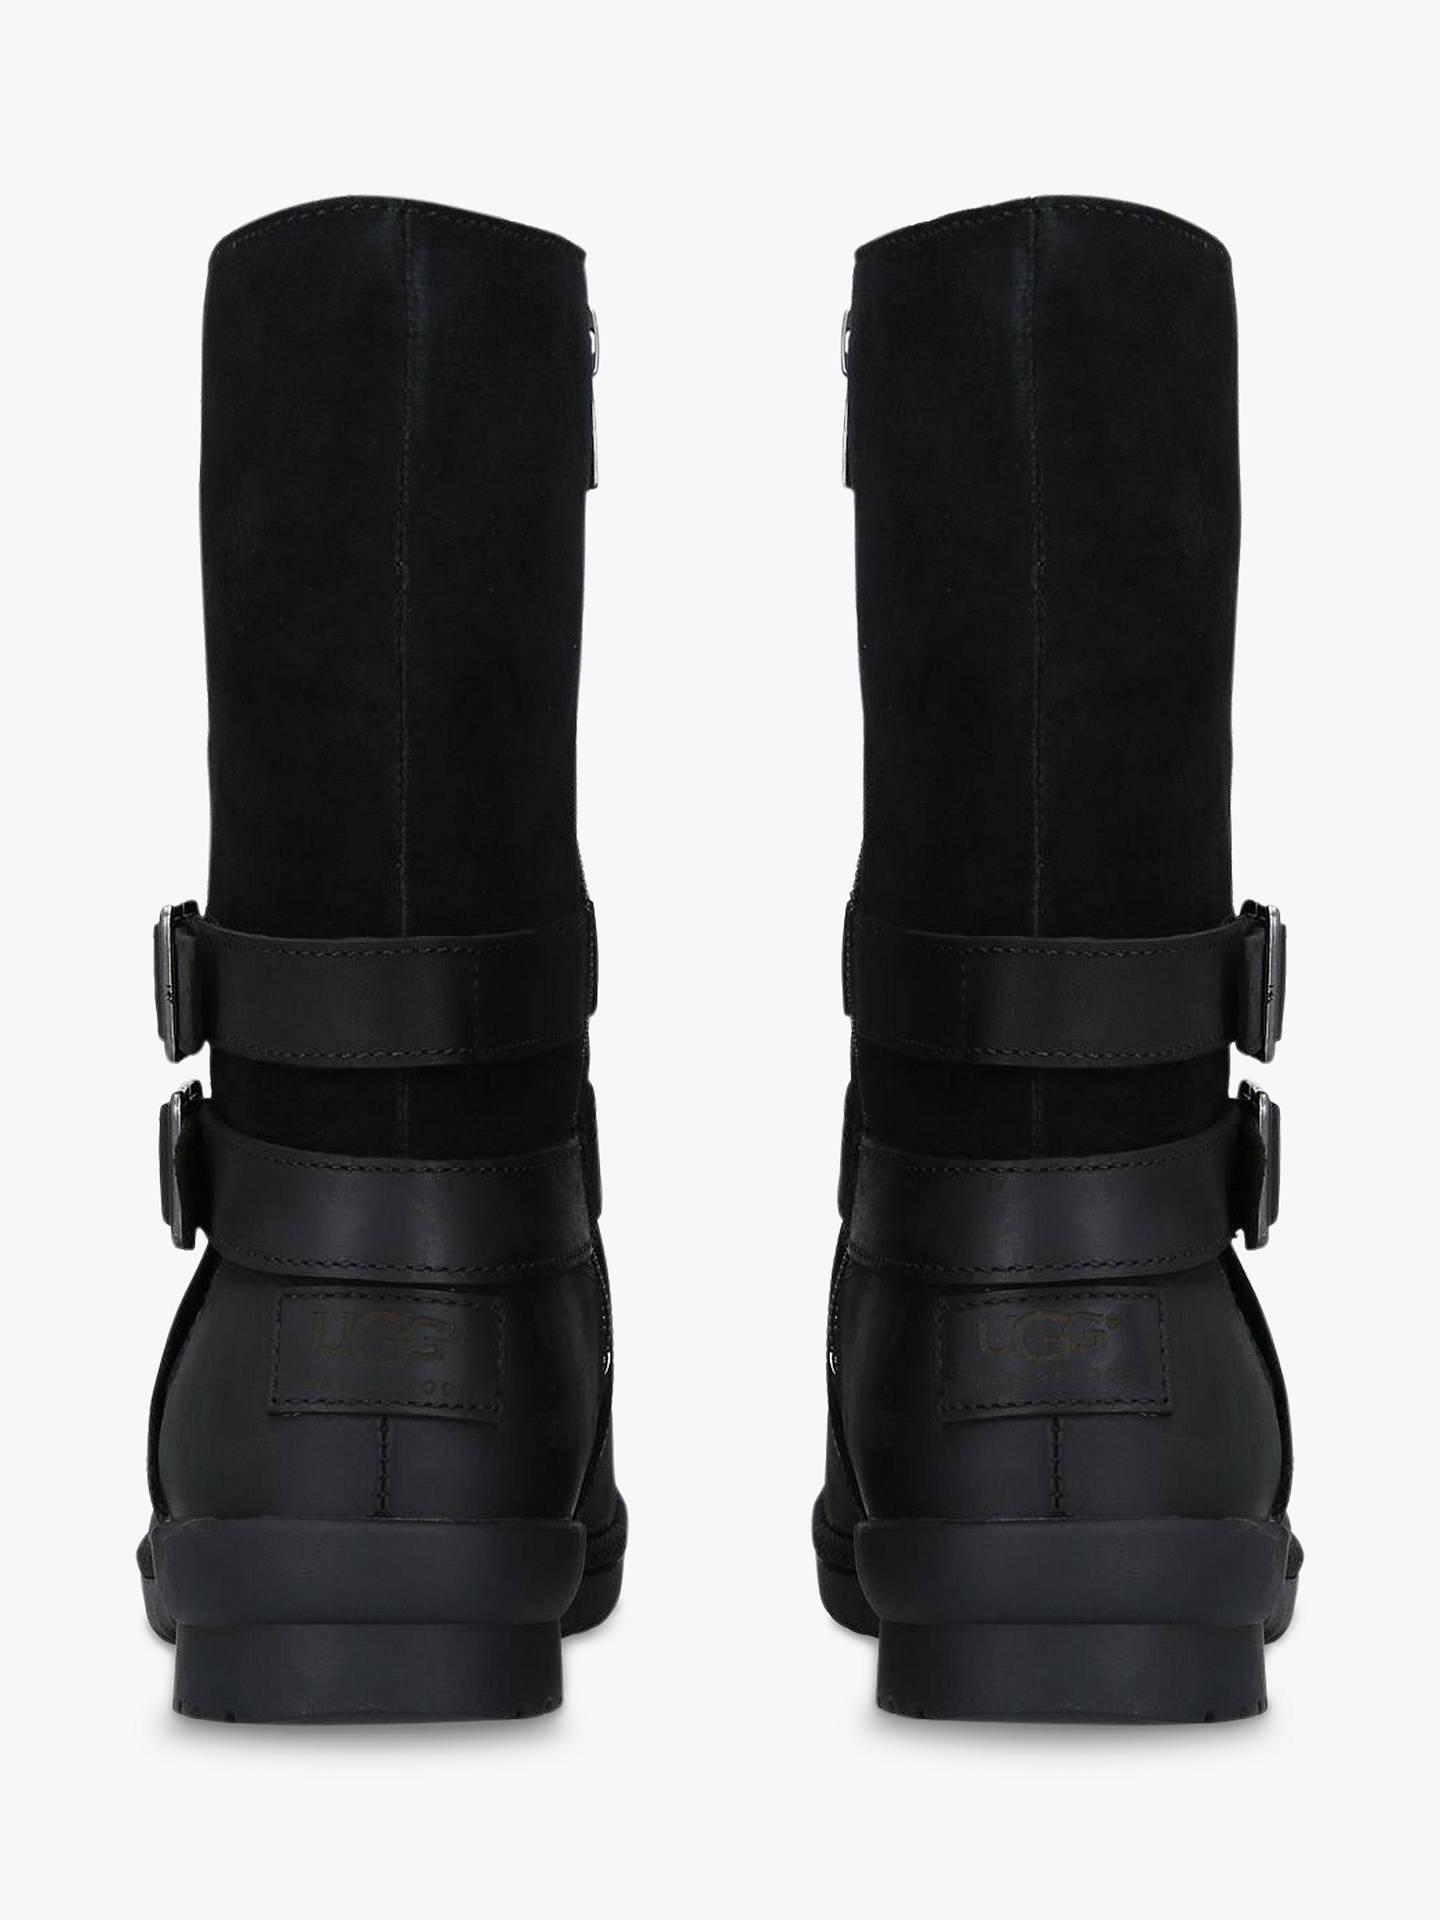 79d02a44af9 UGG Lorna Buckle Ankle Boots at John Lewis & Partners